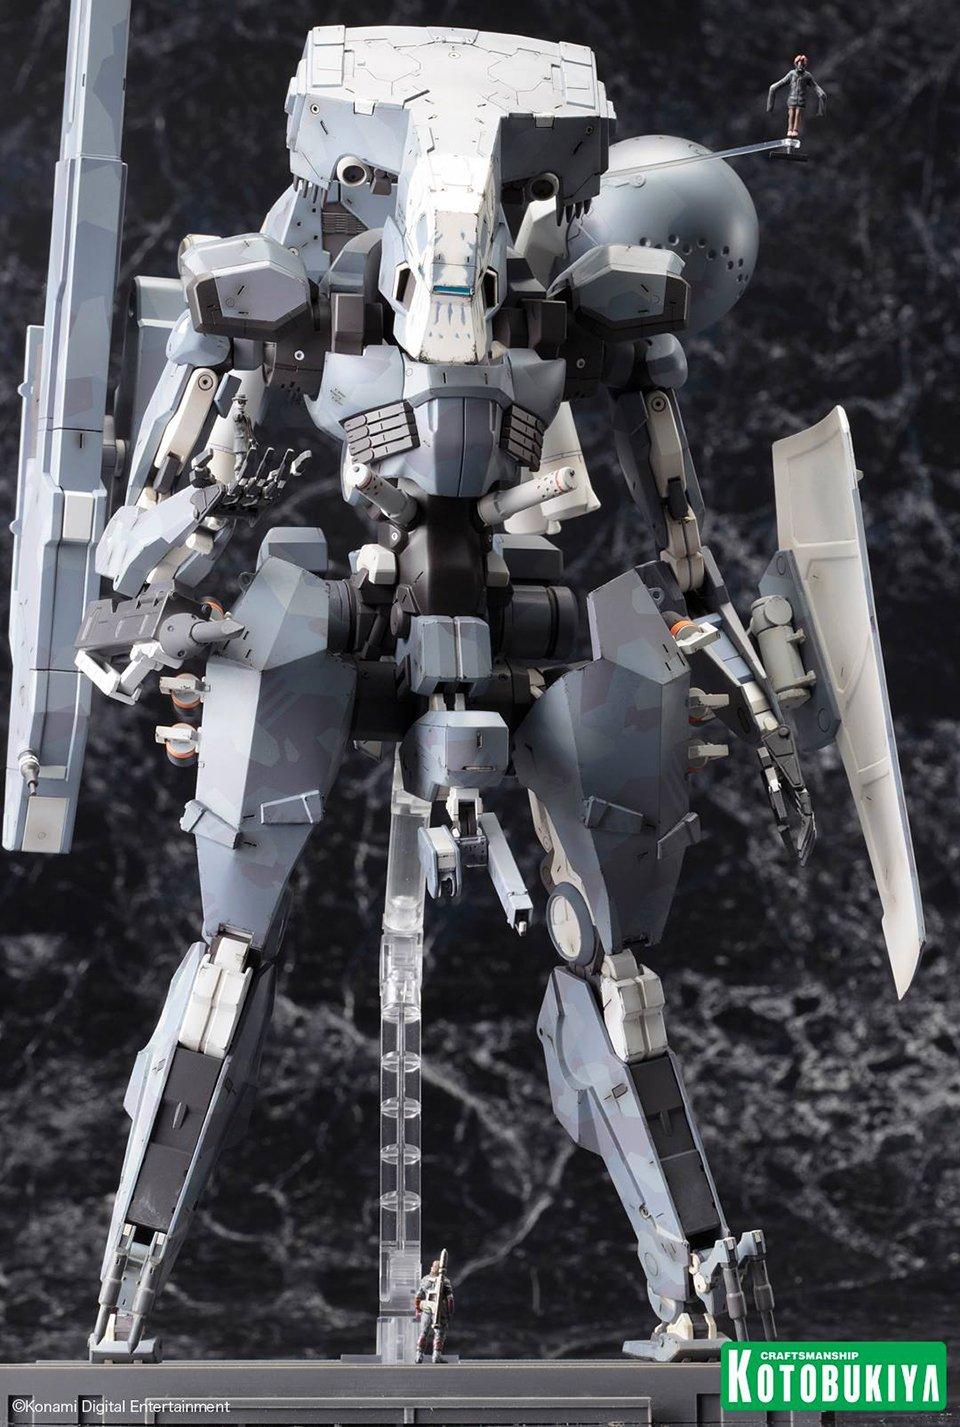 Kotobukiya Metal Gear Sahelanthropus Model Kit